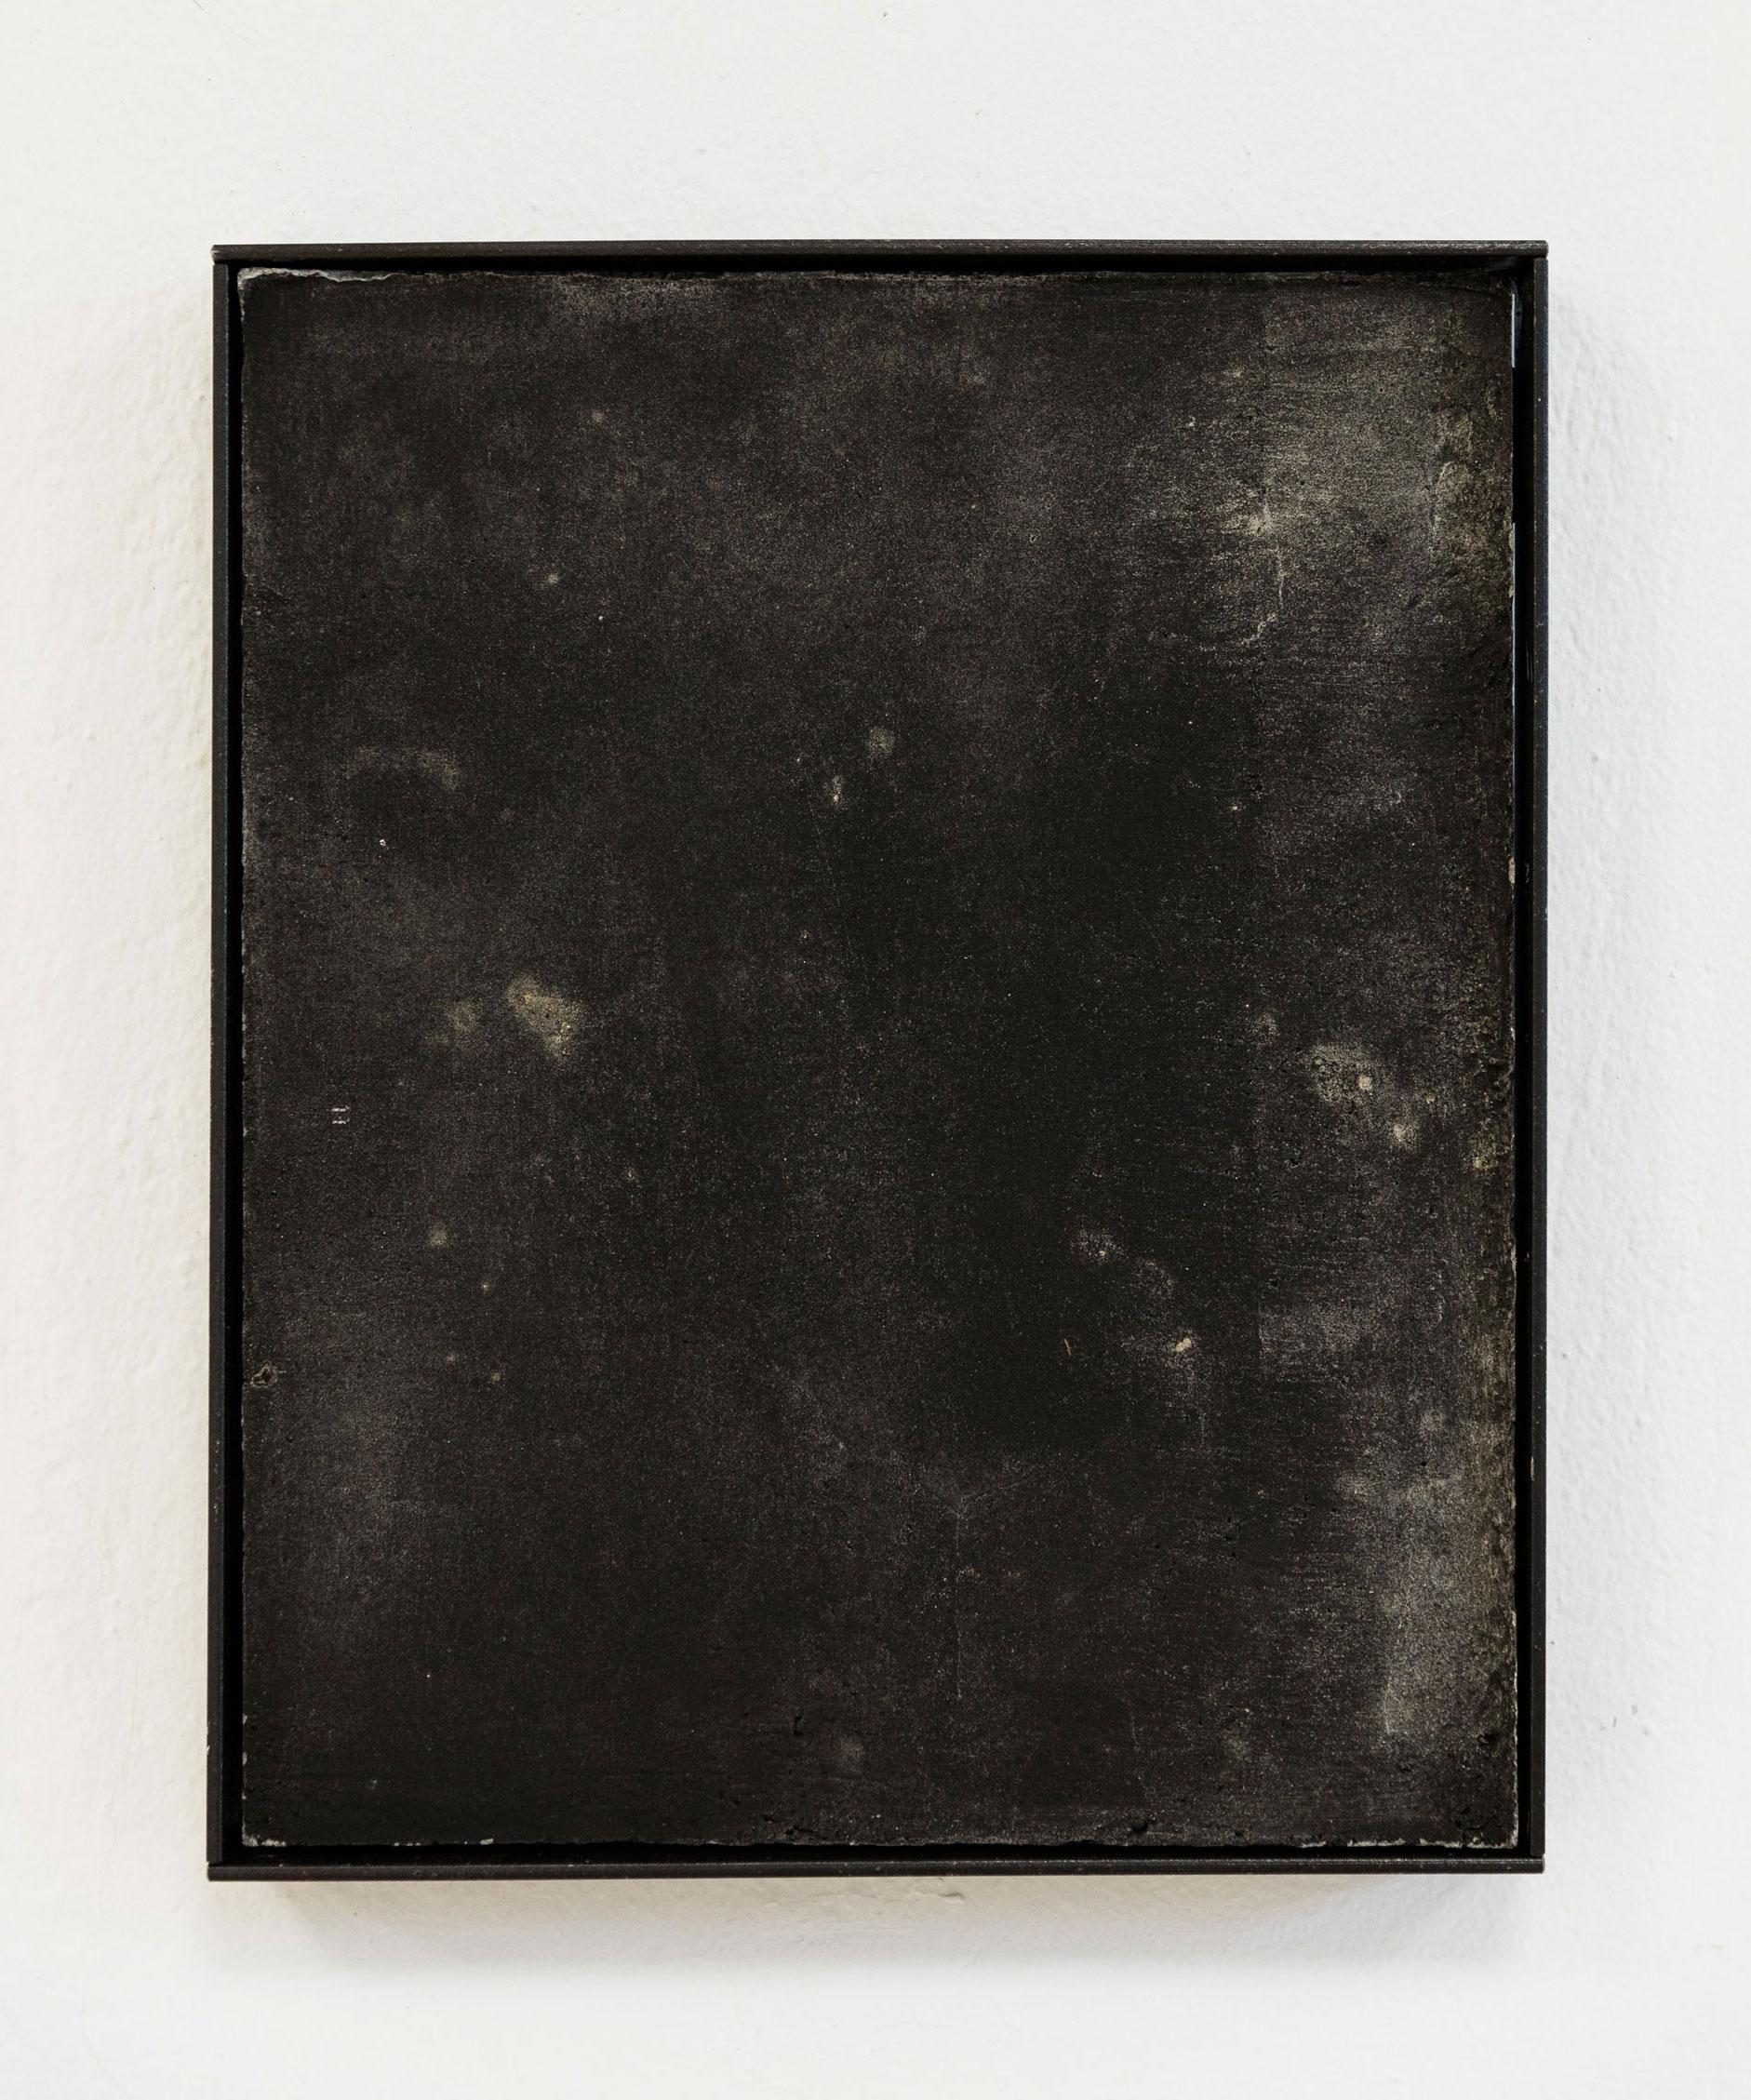 Luka Jana Berchtold_ConcreteDreams_black II_01 (c) Melanie Schneider.jpg